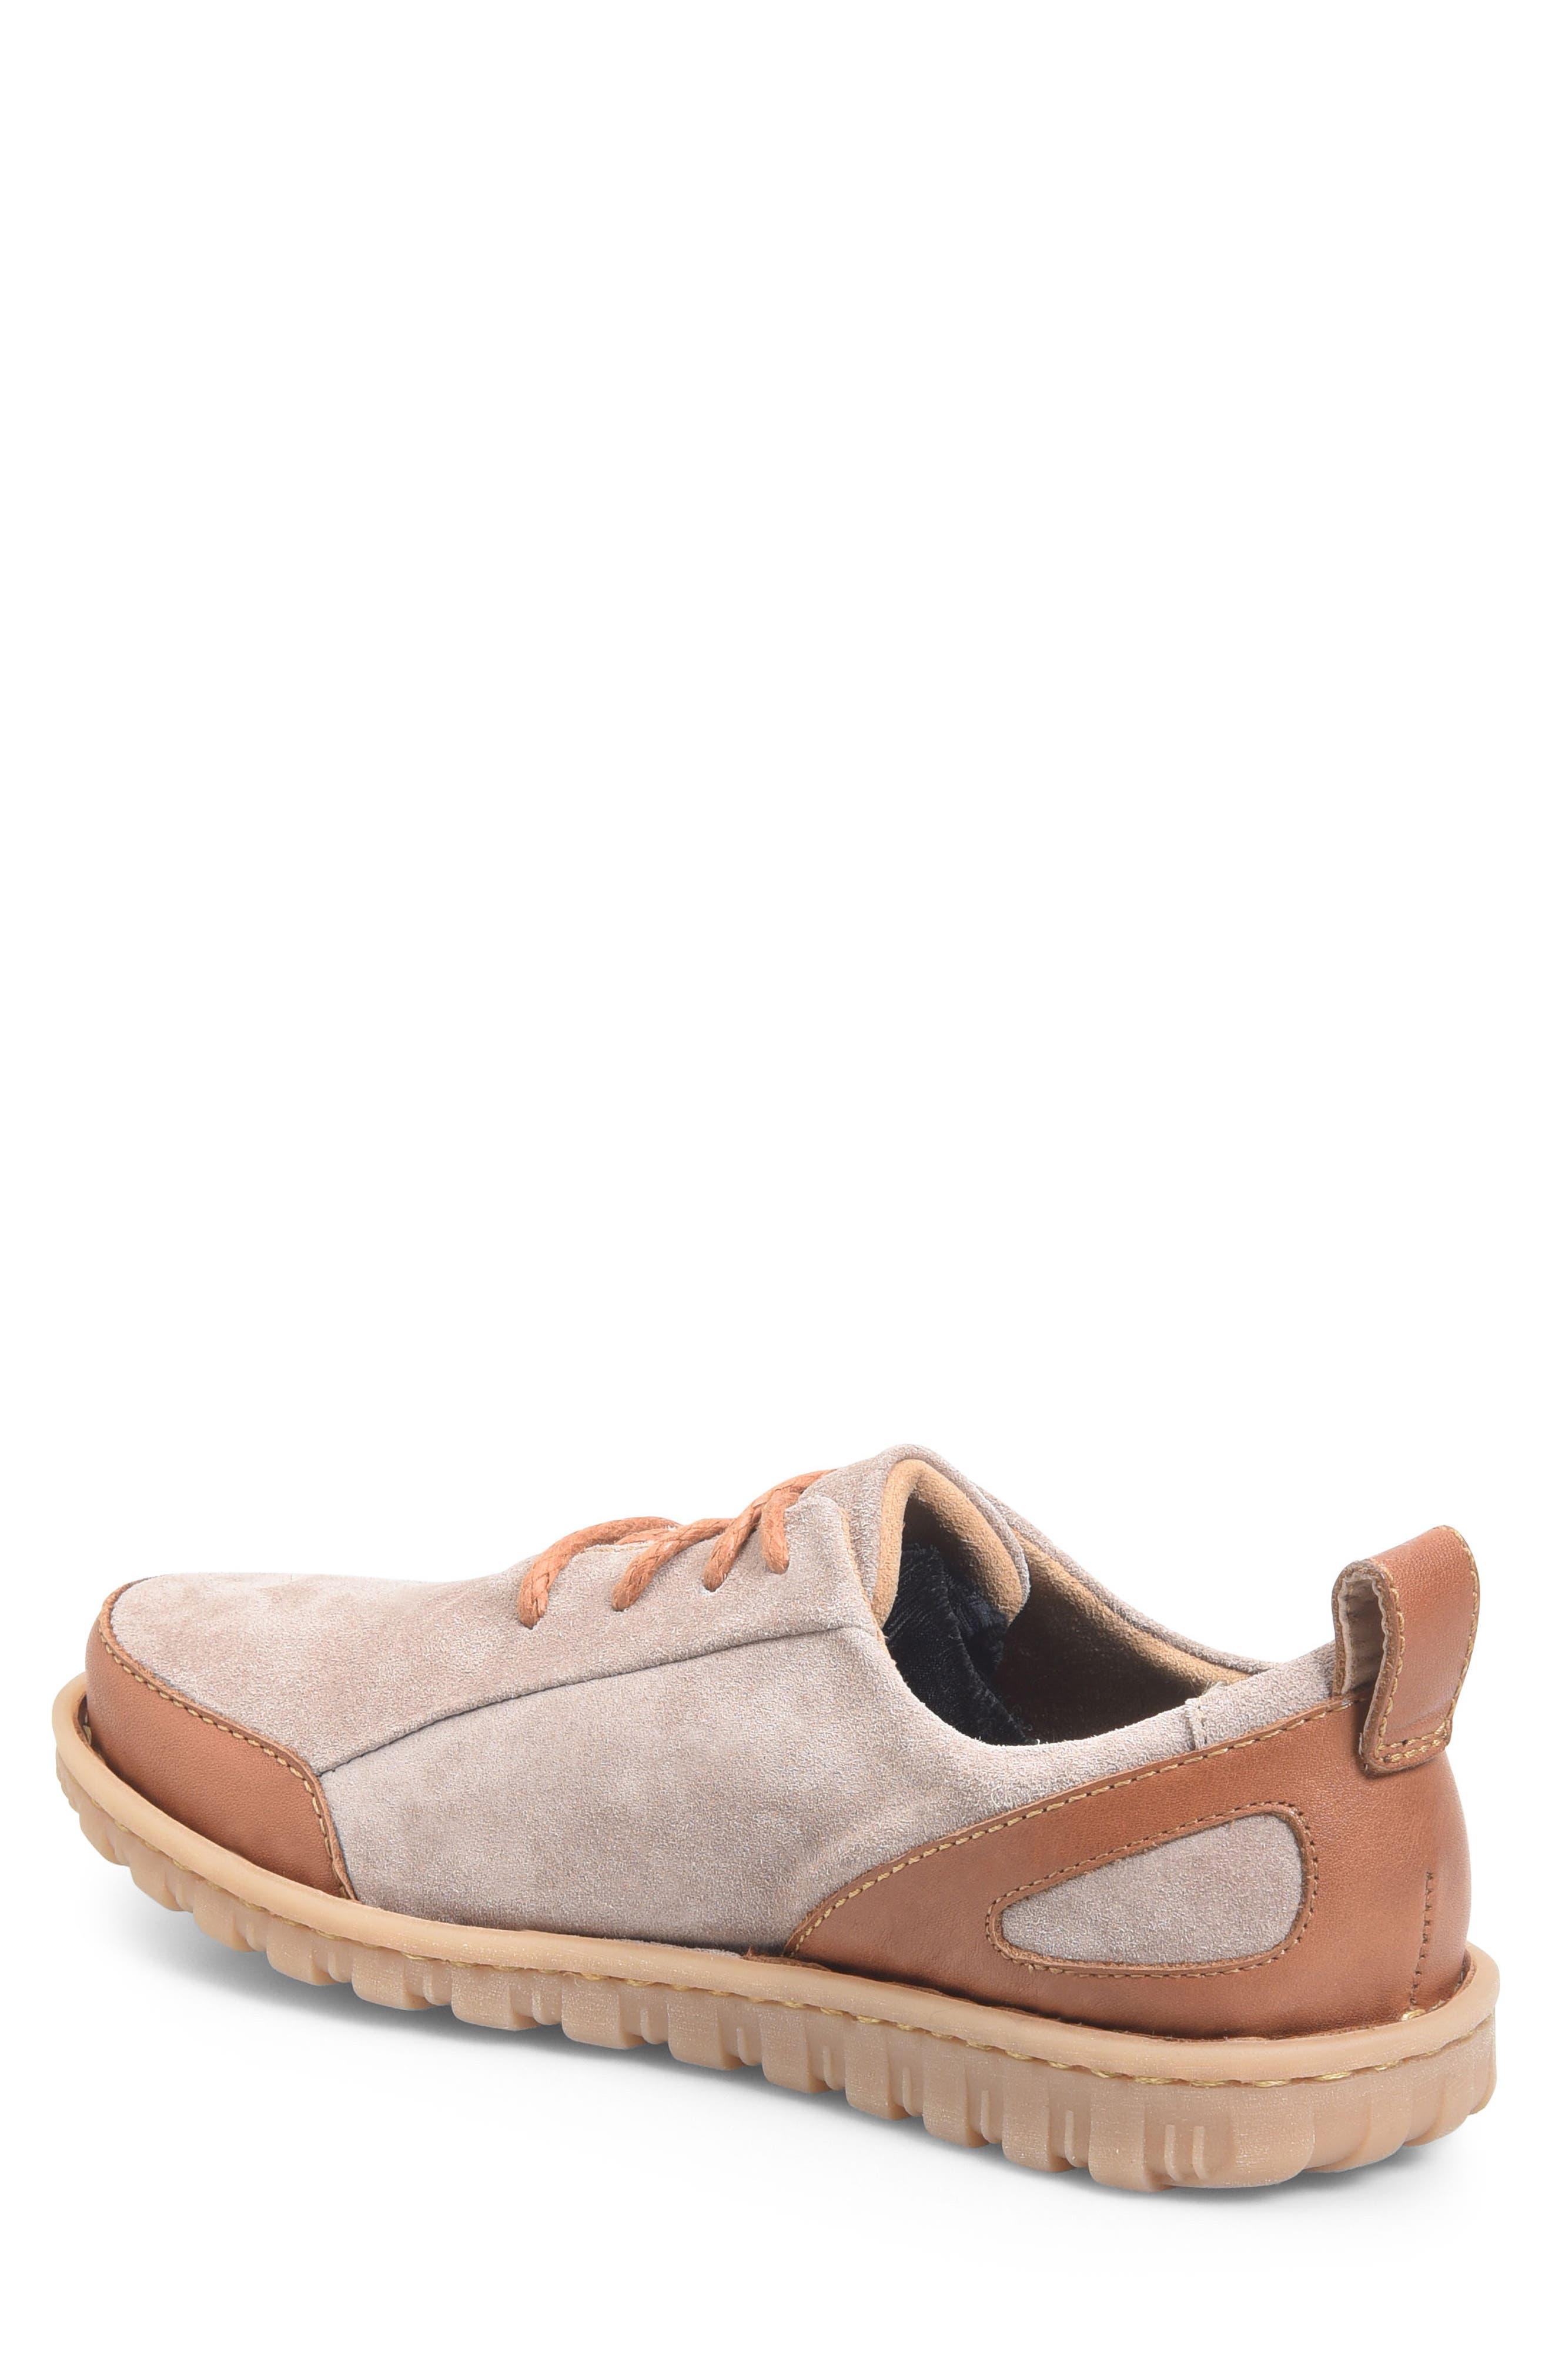 Piper Plain Toe Derby,                             Alternate thumbnail 2, color,                             Grey/ Bronze Leather